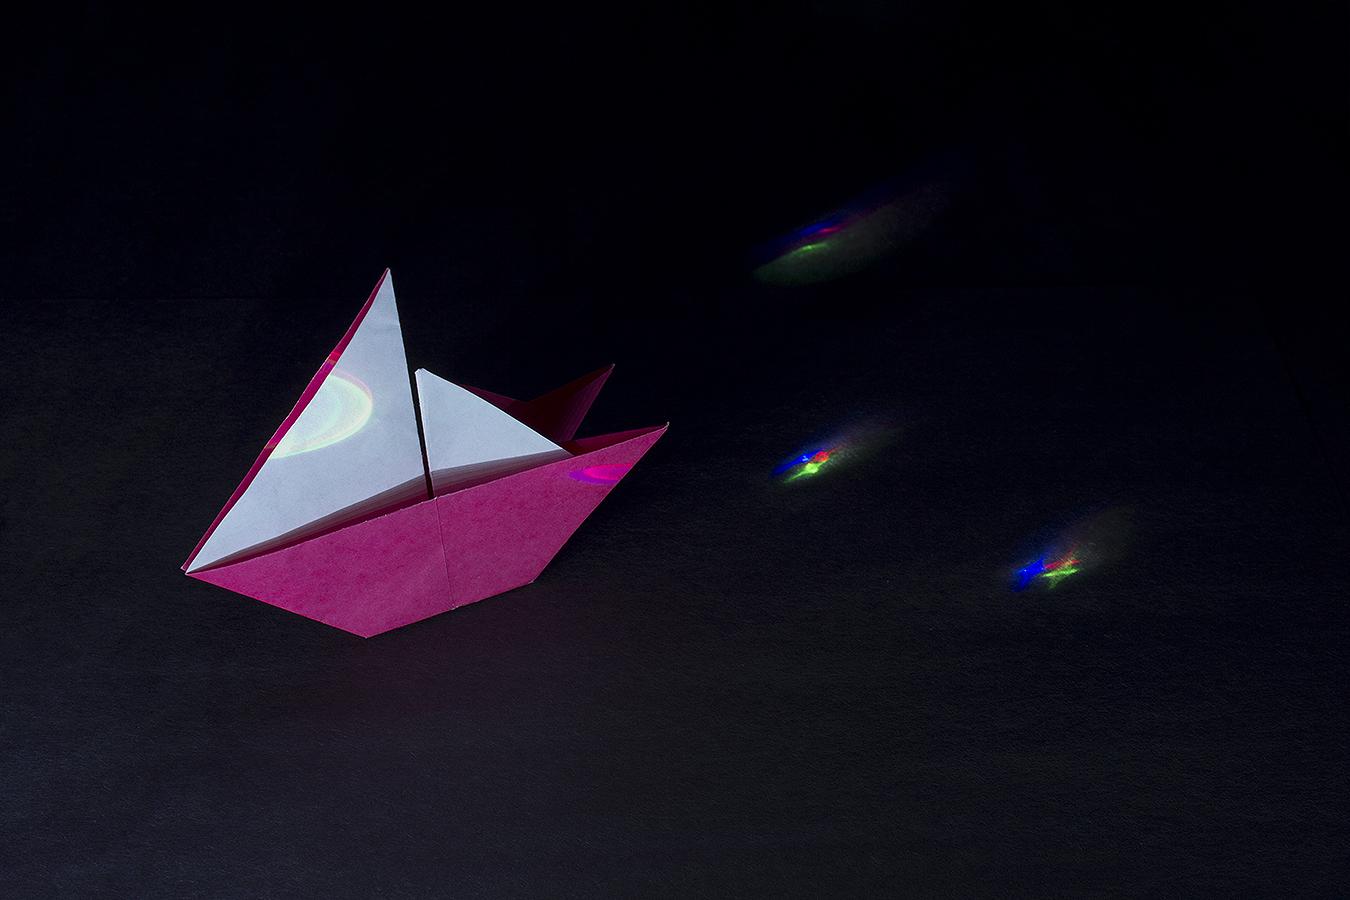 3_Night_Sail_Jonathan_Tang_UPenn_Tony_Ward_Studio_Long_Exposure_Low_Light_LED_Optics_Origami_Paper